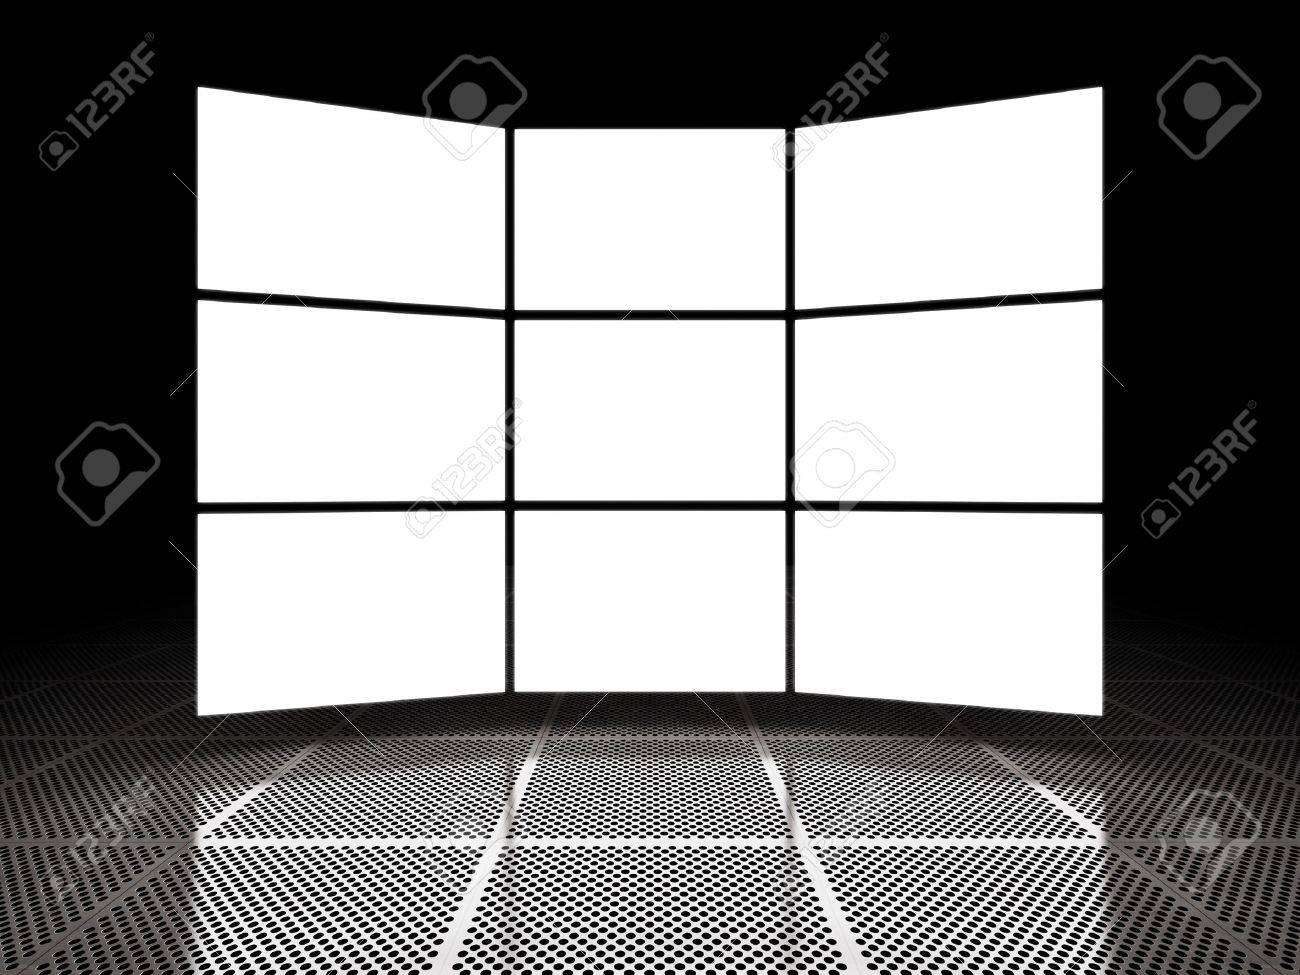 Empty light screen displays around black space Stock Photo - 12389154